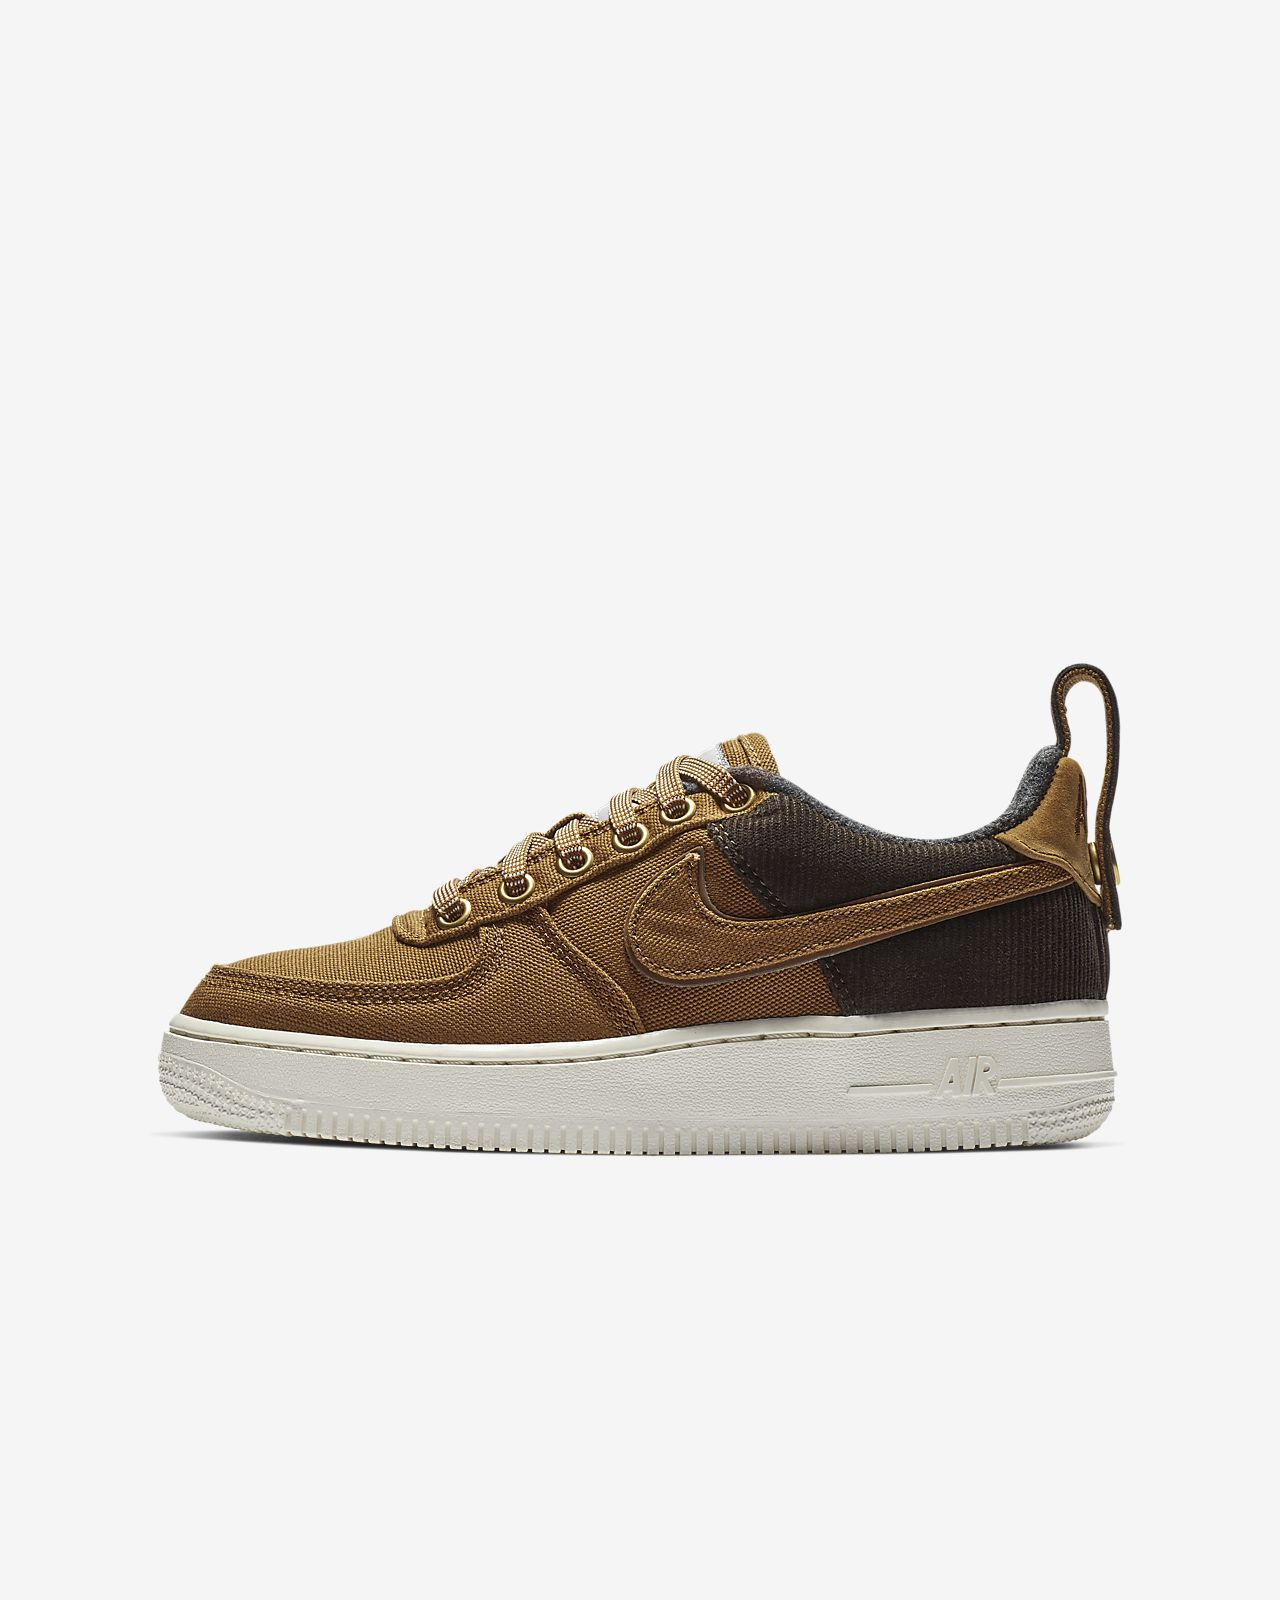 buy online 47b7c 40591 ... shop nike air force 1 premium wip sko til store børn b9cab 2b85f